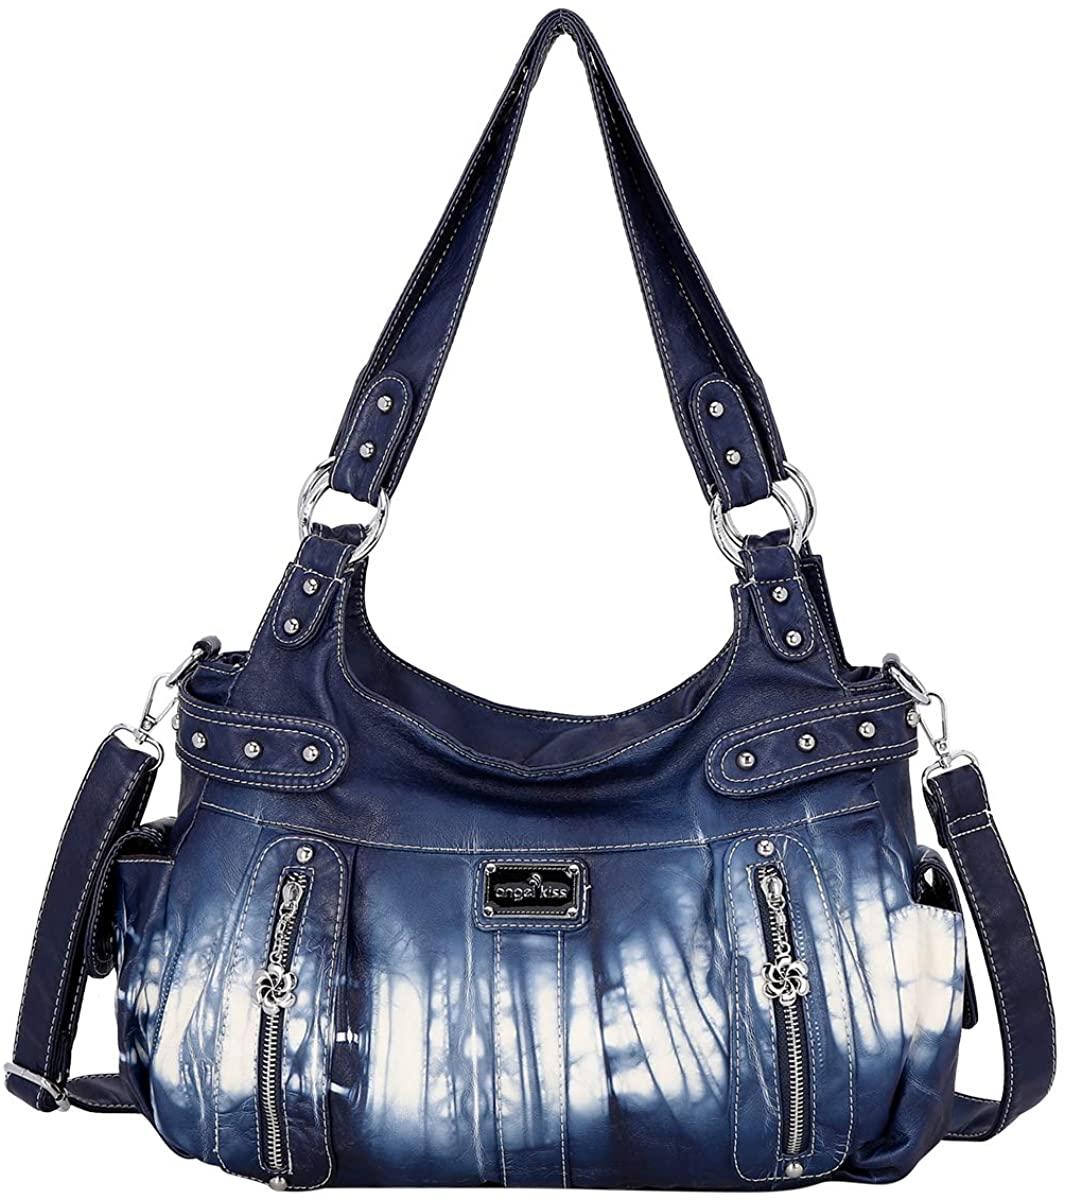 Handbag Hobo Women Handbag Roomy Multiple Pockets Street ladies Shoulder Bag Fashion PU Tote Satchel Bag for Women